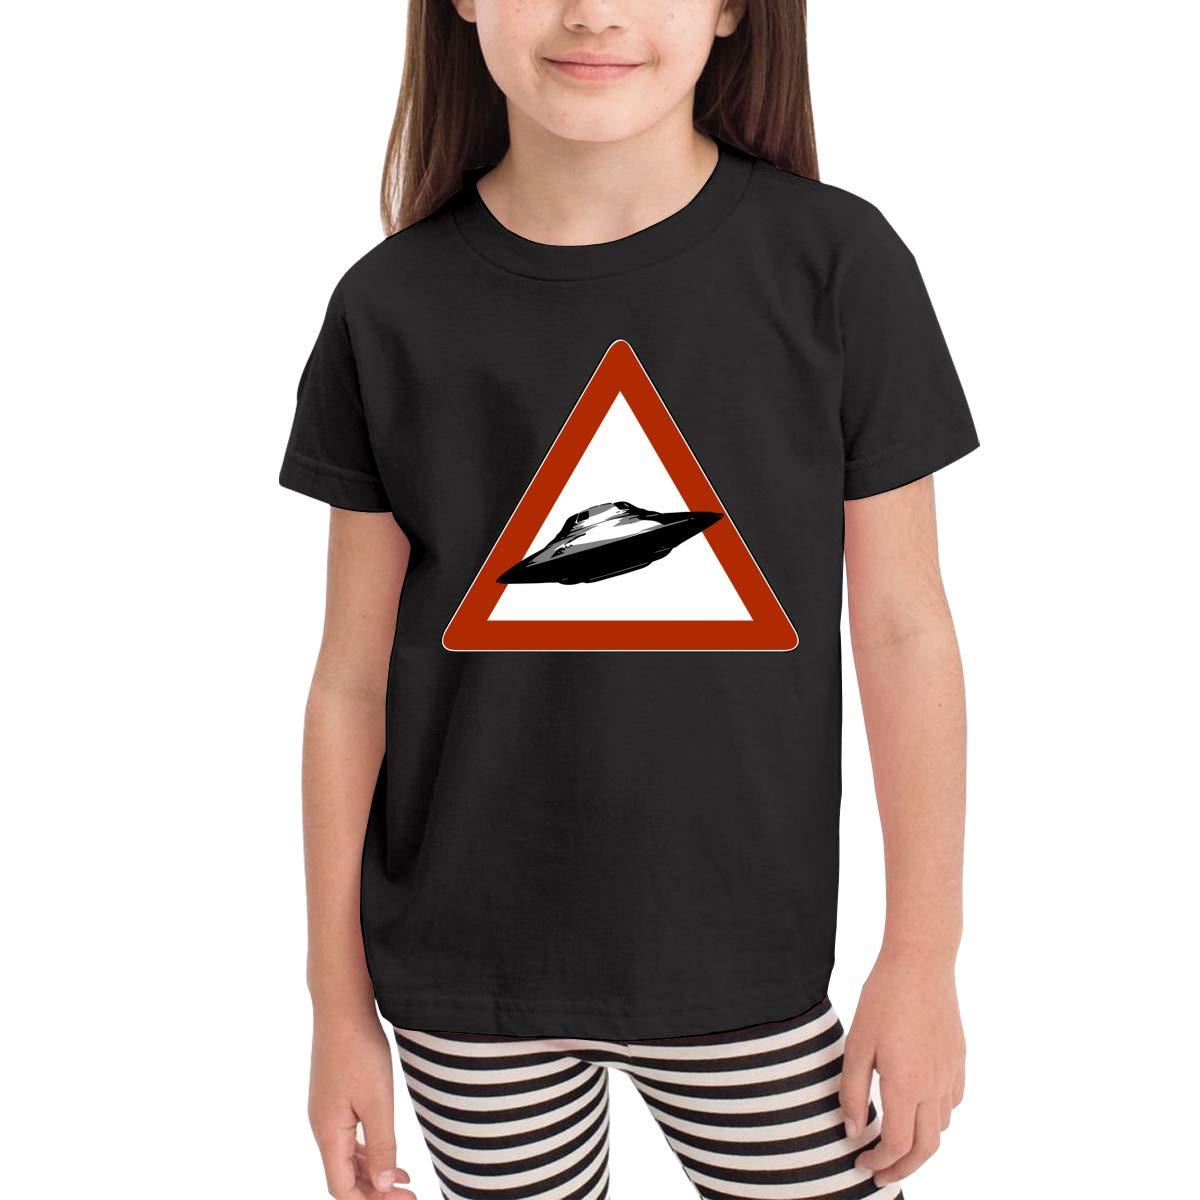 Danger Road UFO Toddler Boys Girls Short Sleeve T Shirt Kids Summer Top Tee 100/% Cotton Clothes 2-6 T